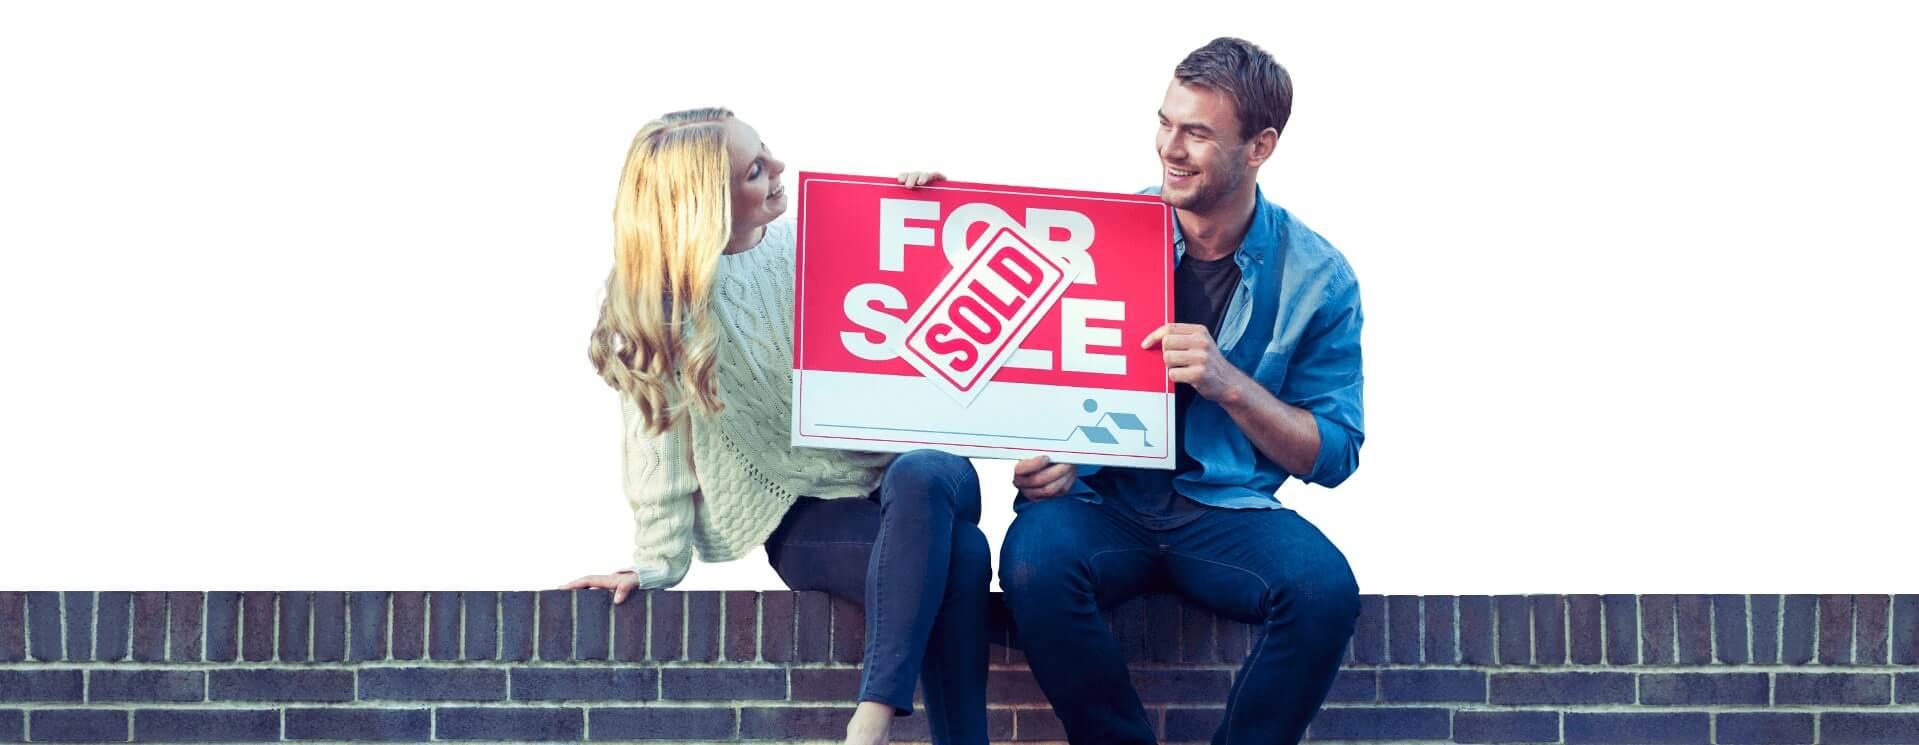 bg image home loans